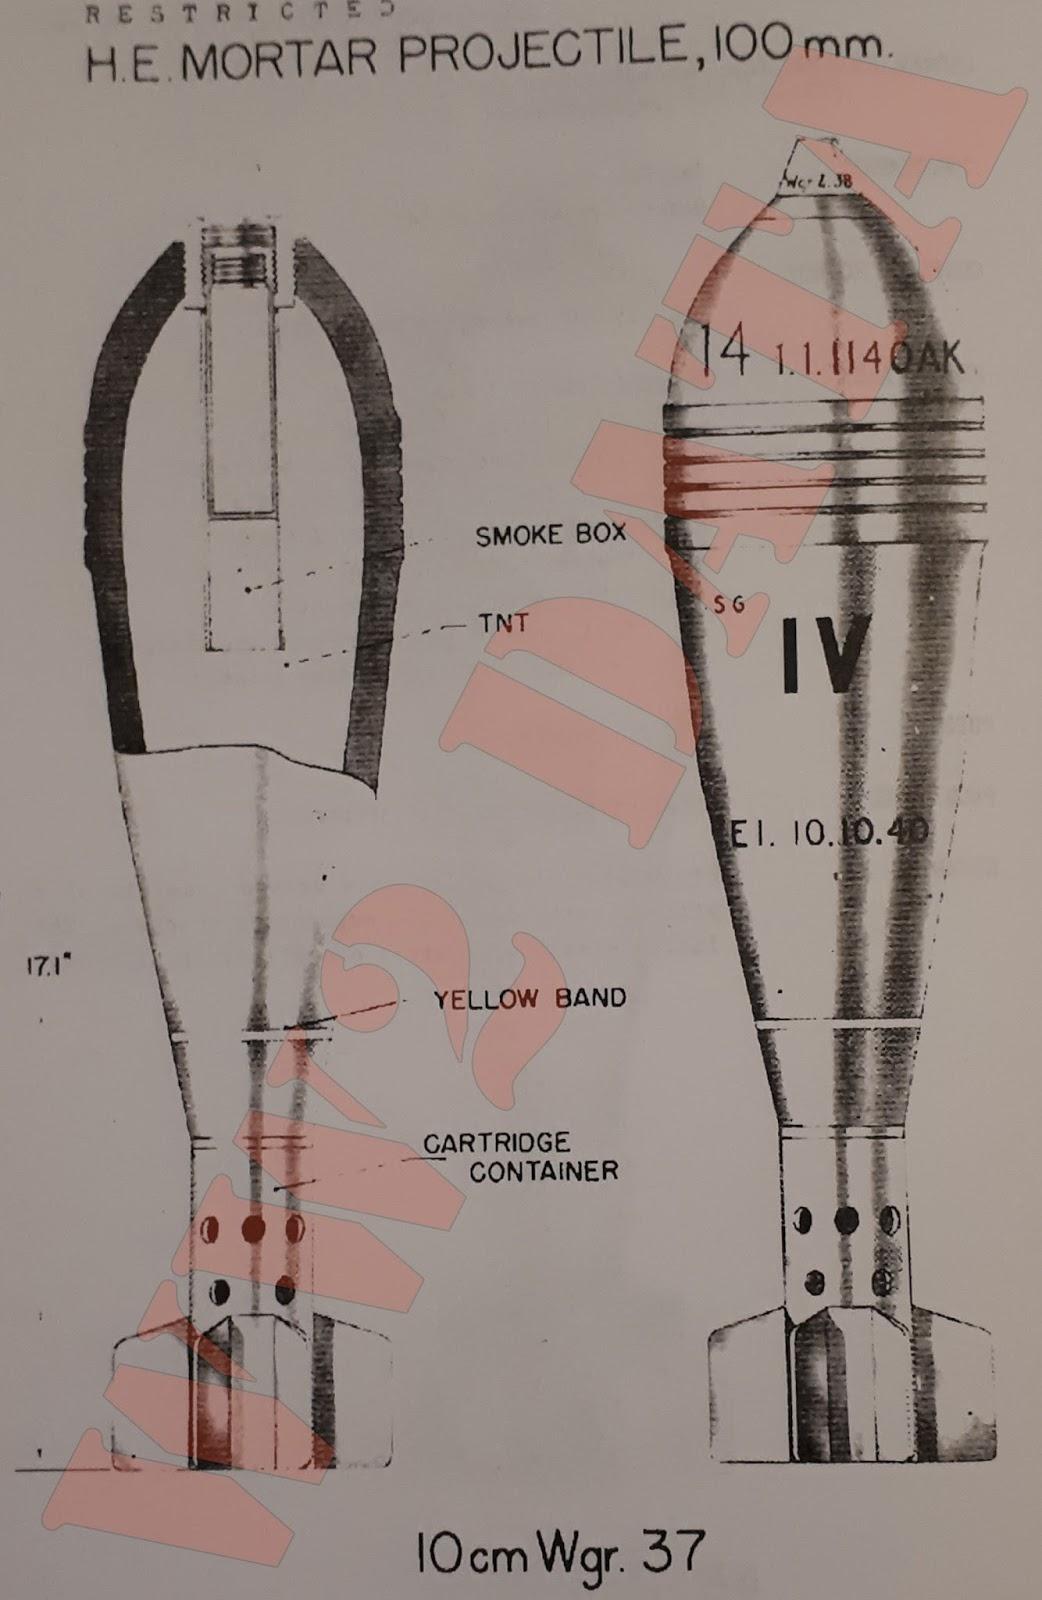 WW2 Equipment Data: German Projectiles - 100mm+ Mortar